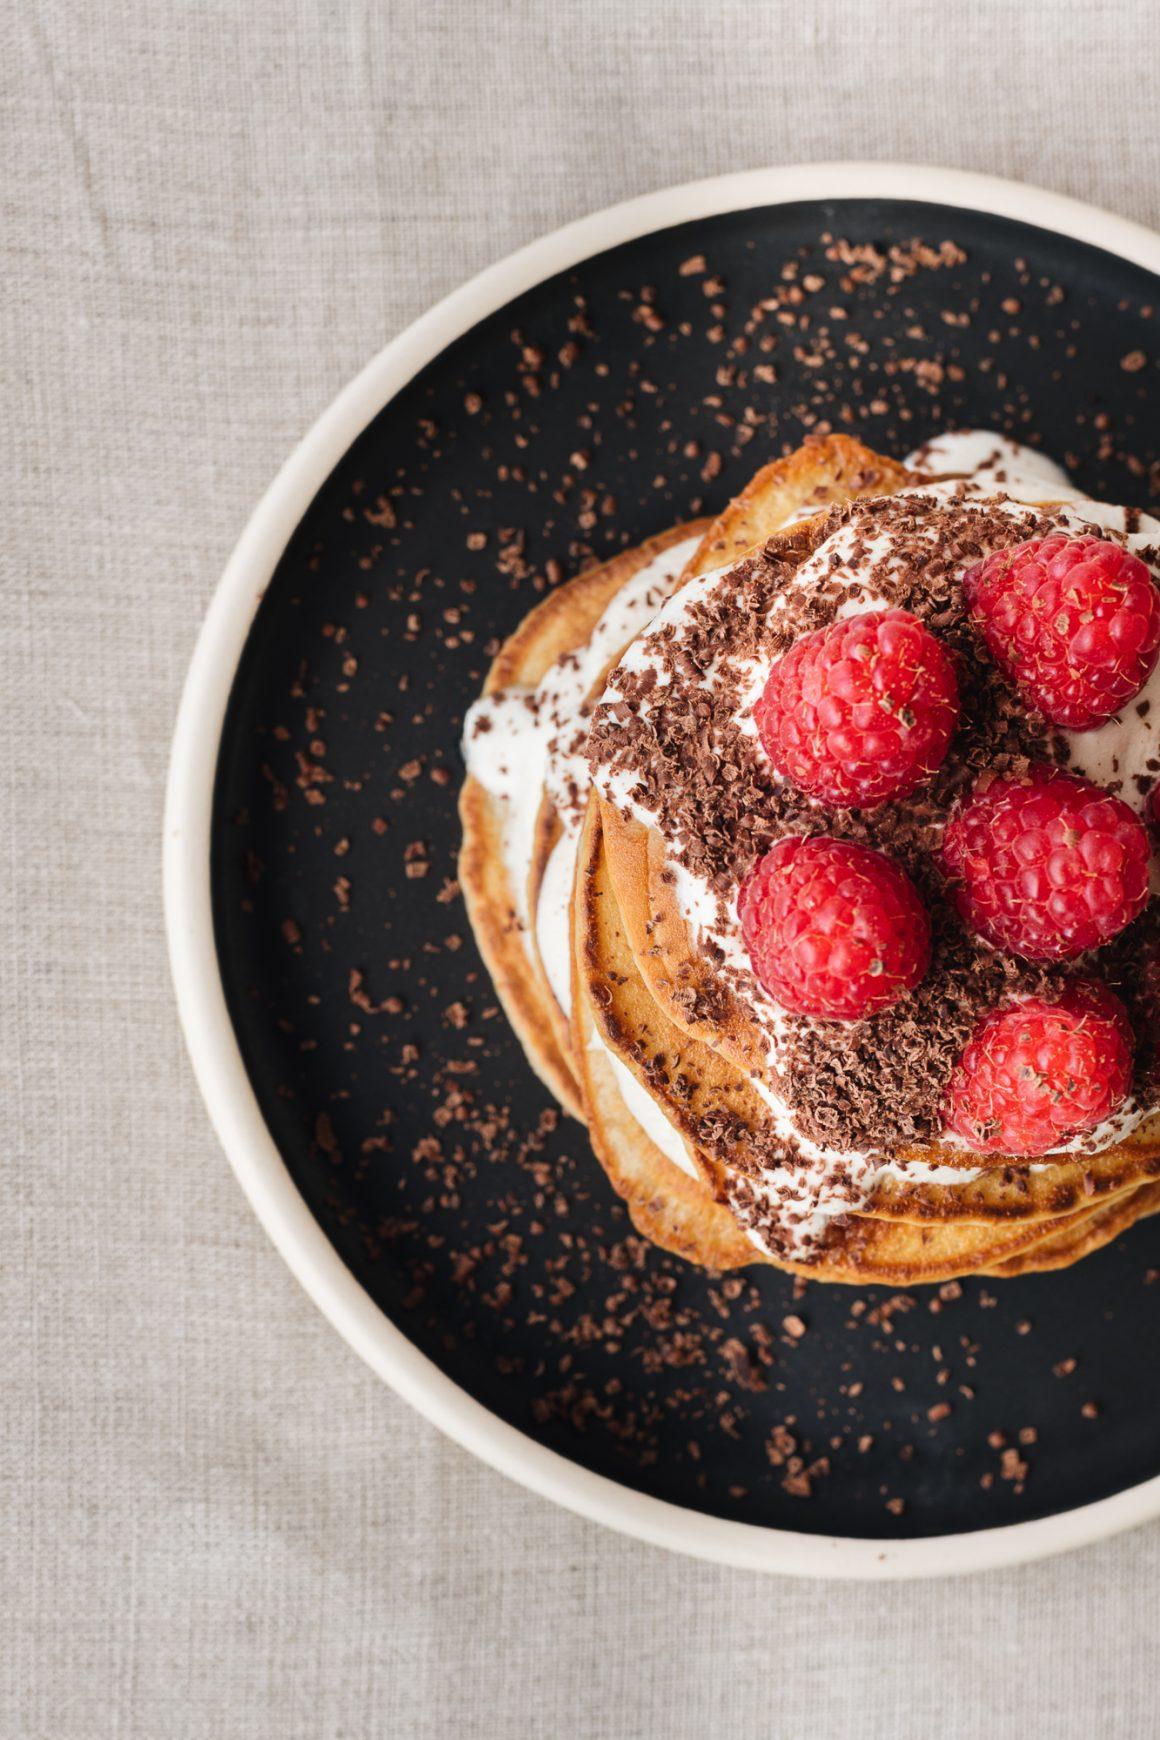 dsc 4841 2 1160x1740 - Gluten Free Fluffy Pancakes